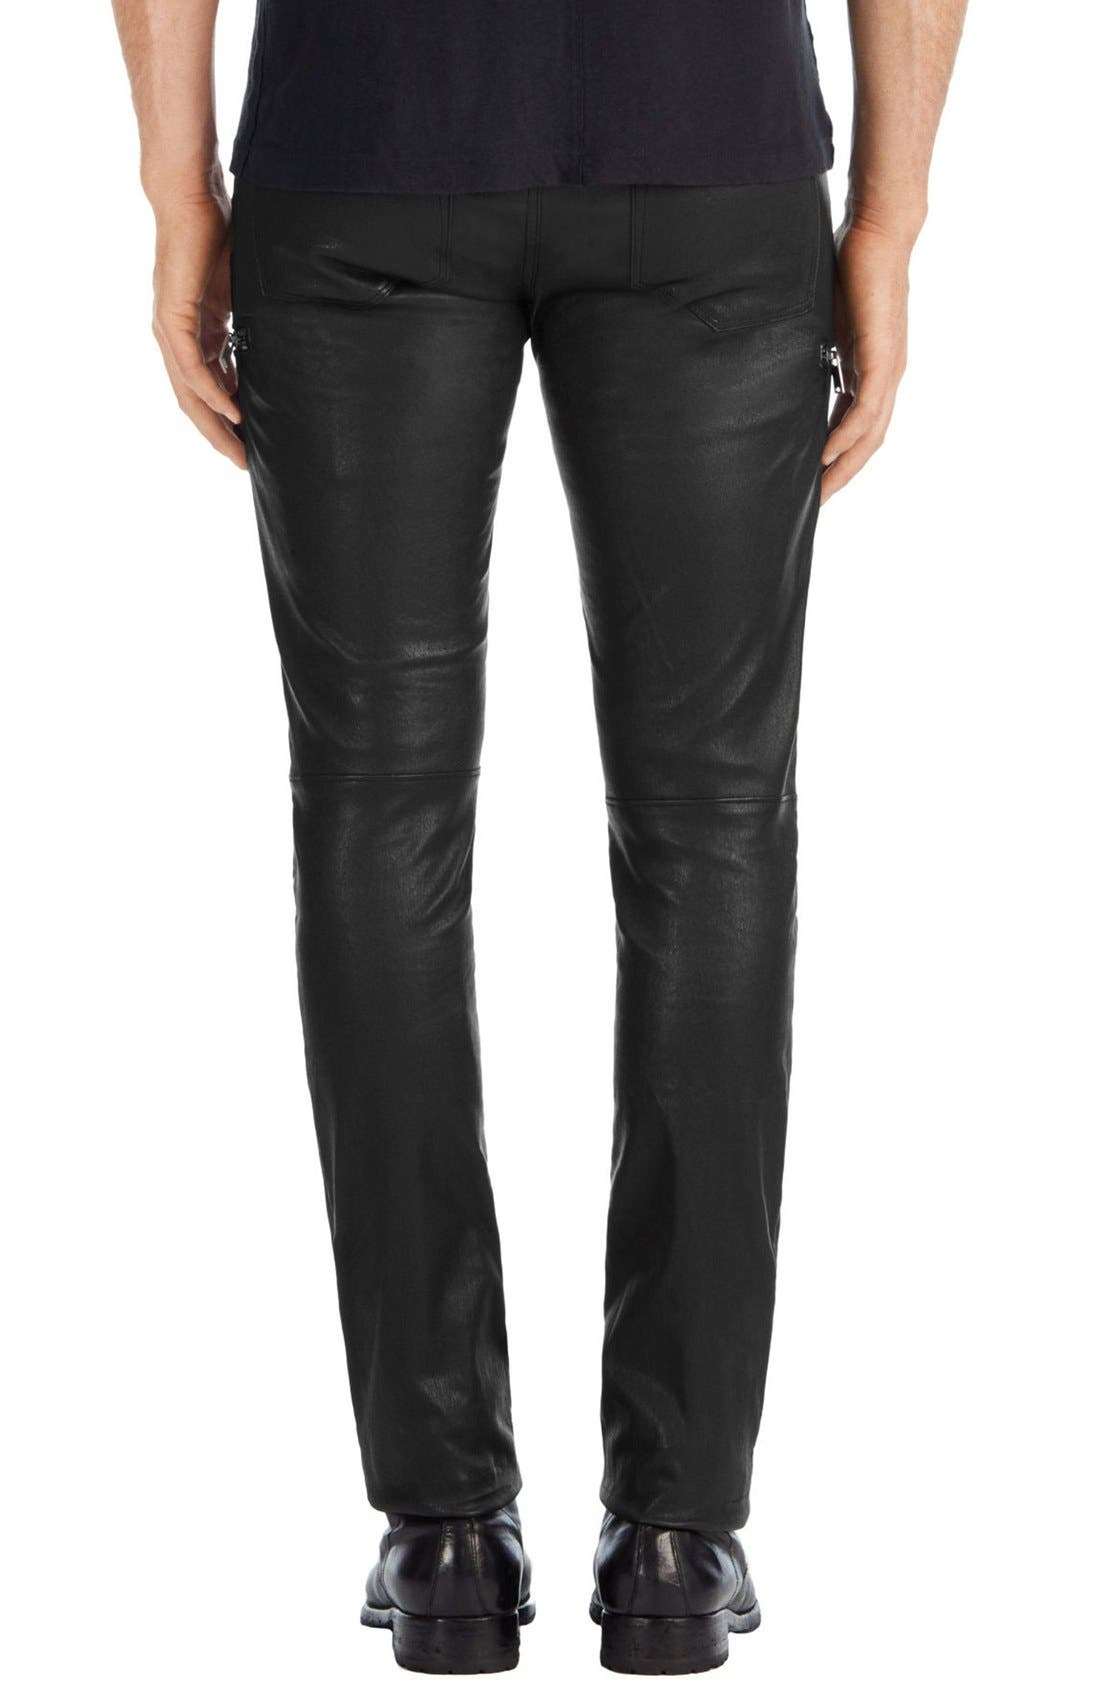 Acrux Skinny Fit Moto Leather Pants,                             Alternate thumbnail 5, color,